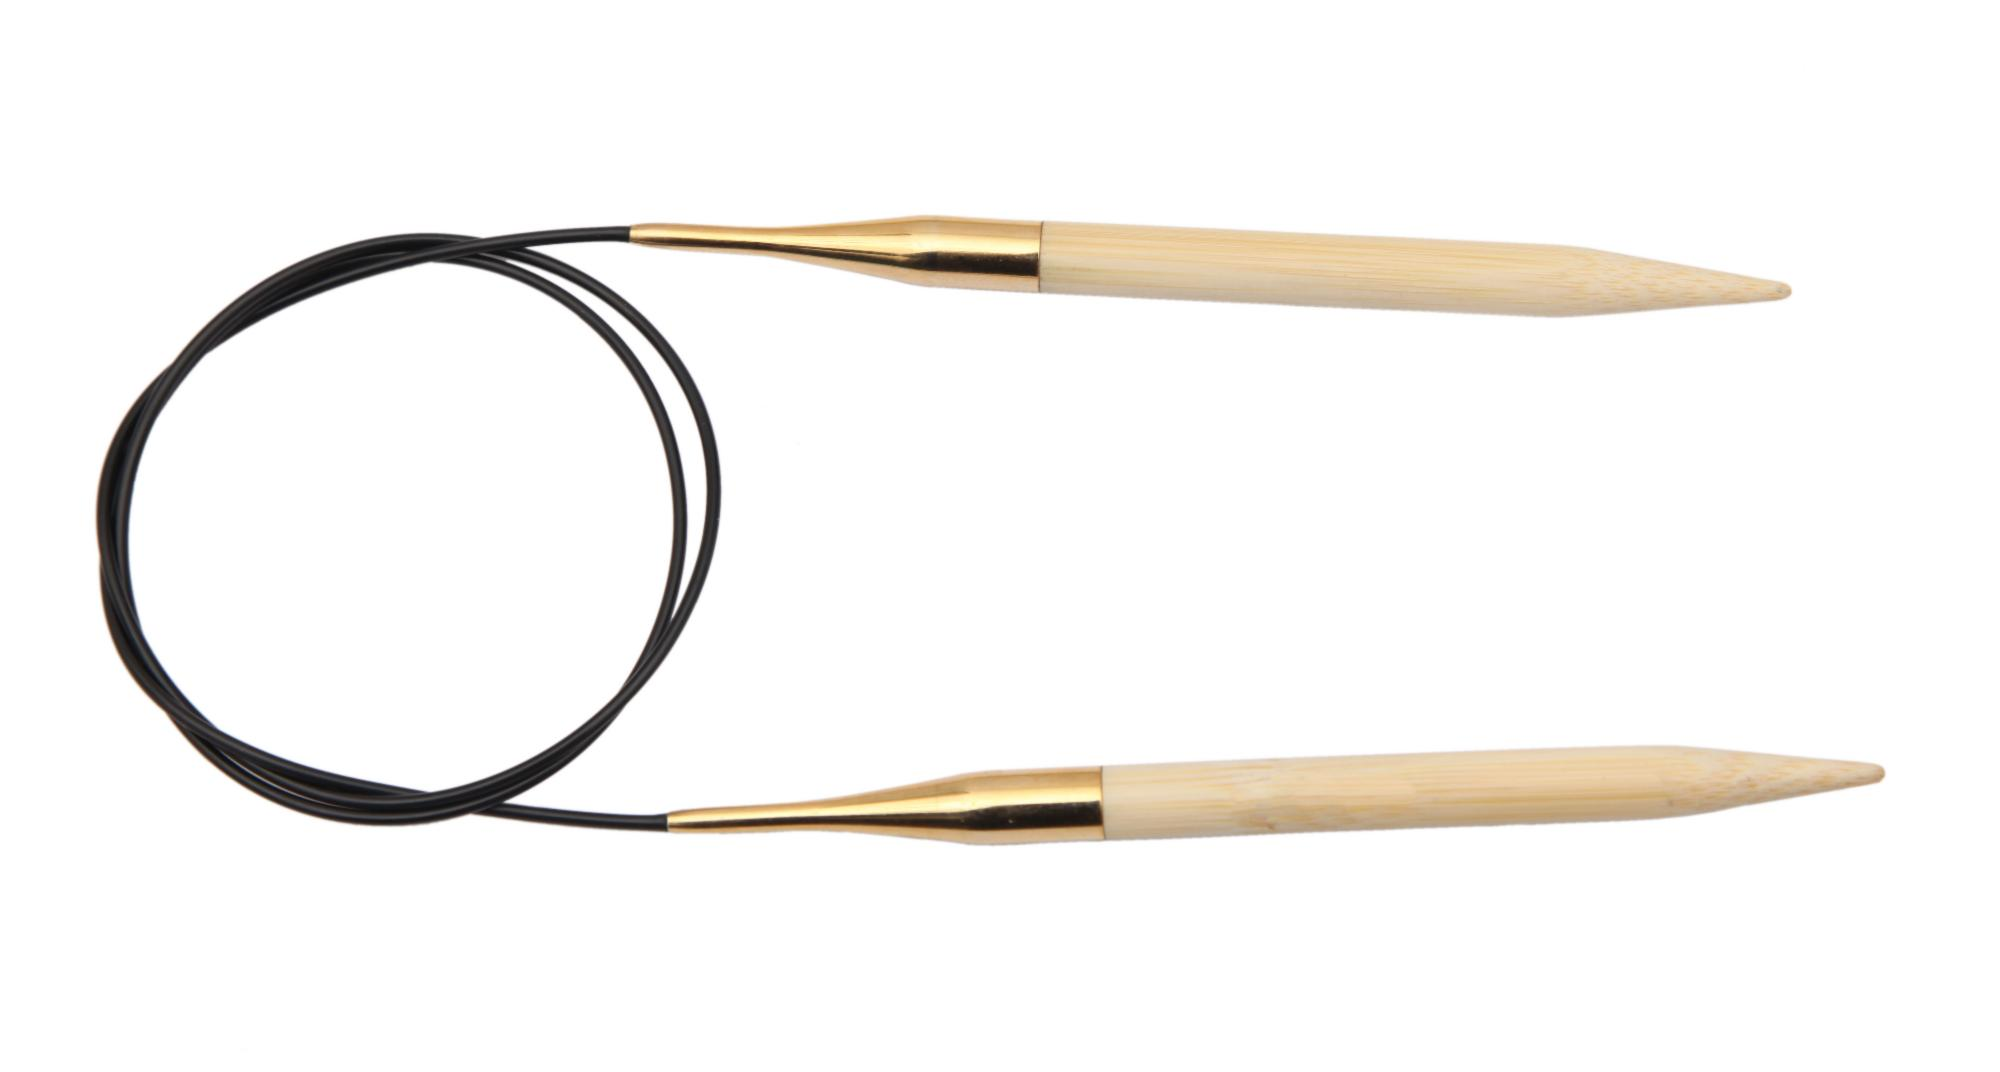 Спицы круговые 40 см Bamboo KnitPro, 22210, 5.50 мм